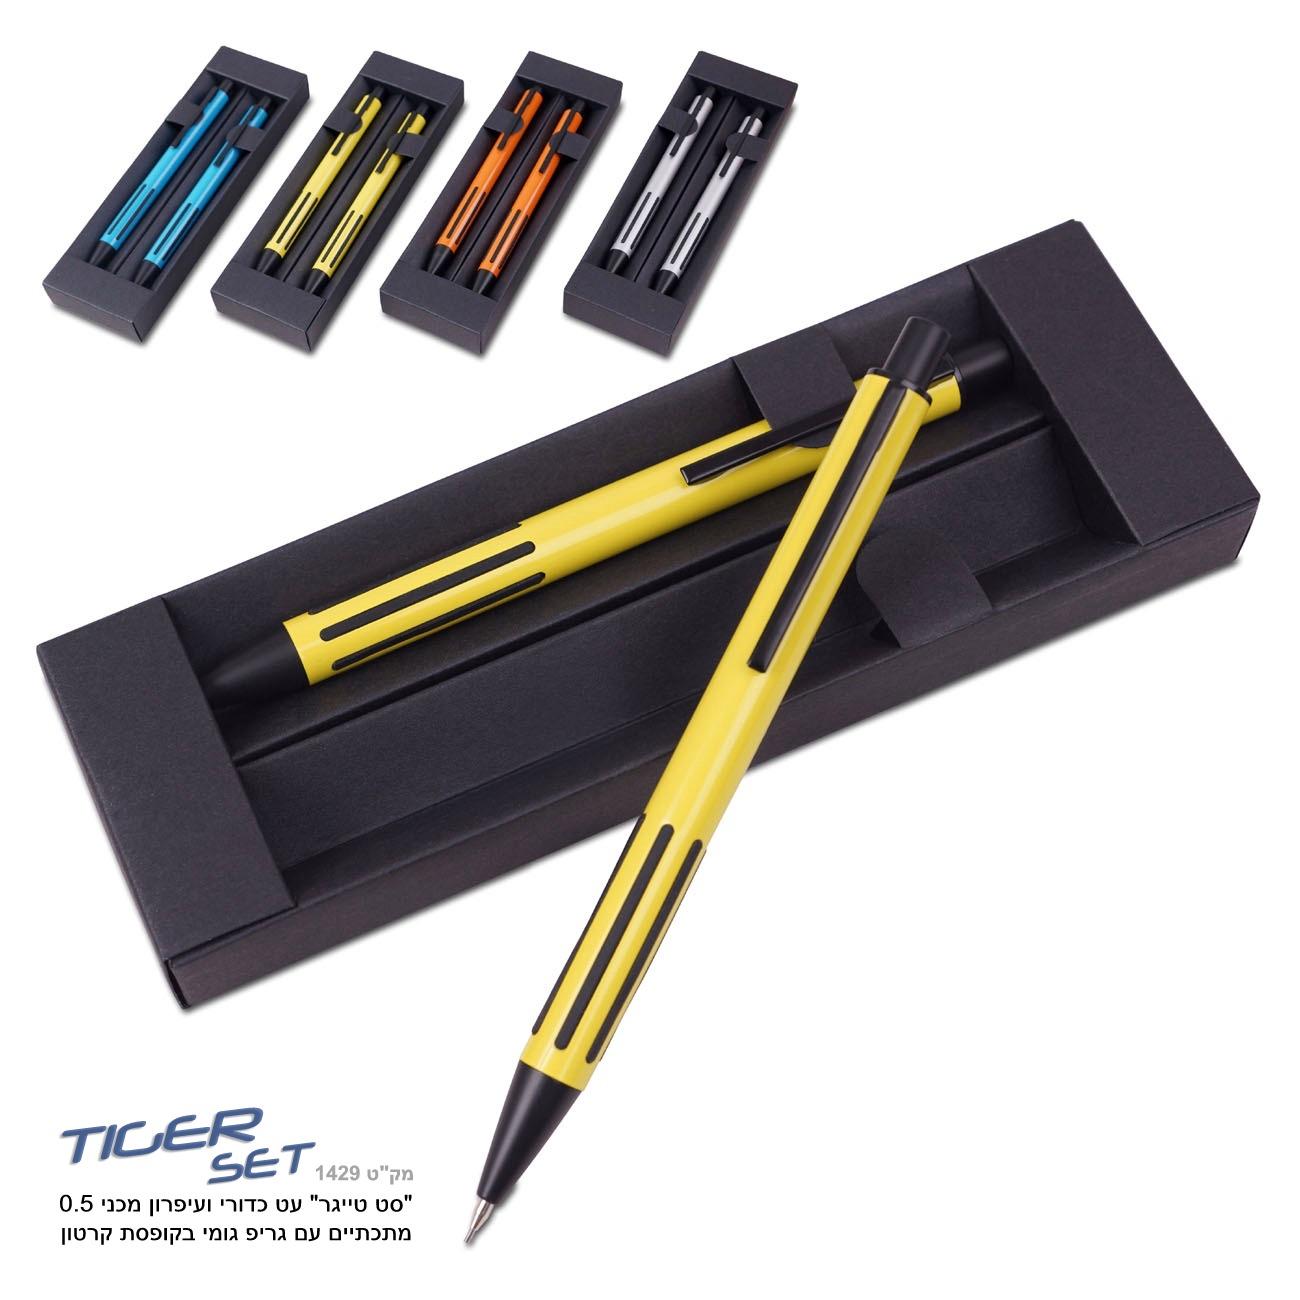 סט עטים | עט כדורי ועפרון מכני